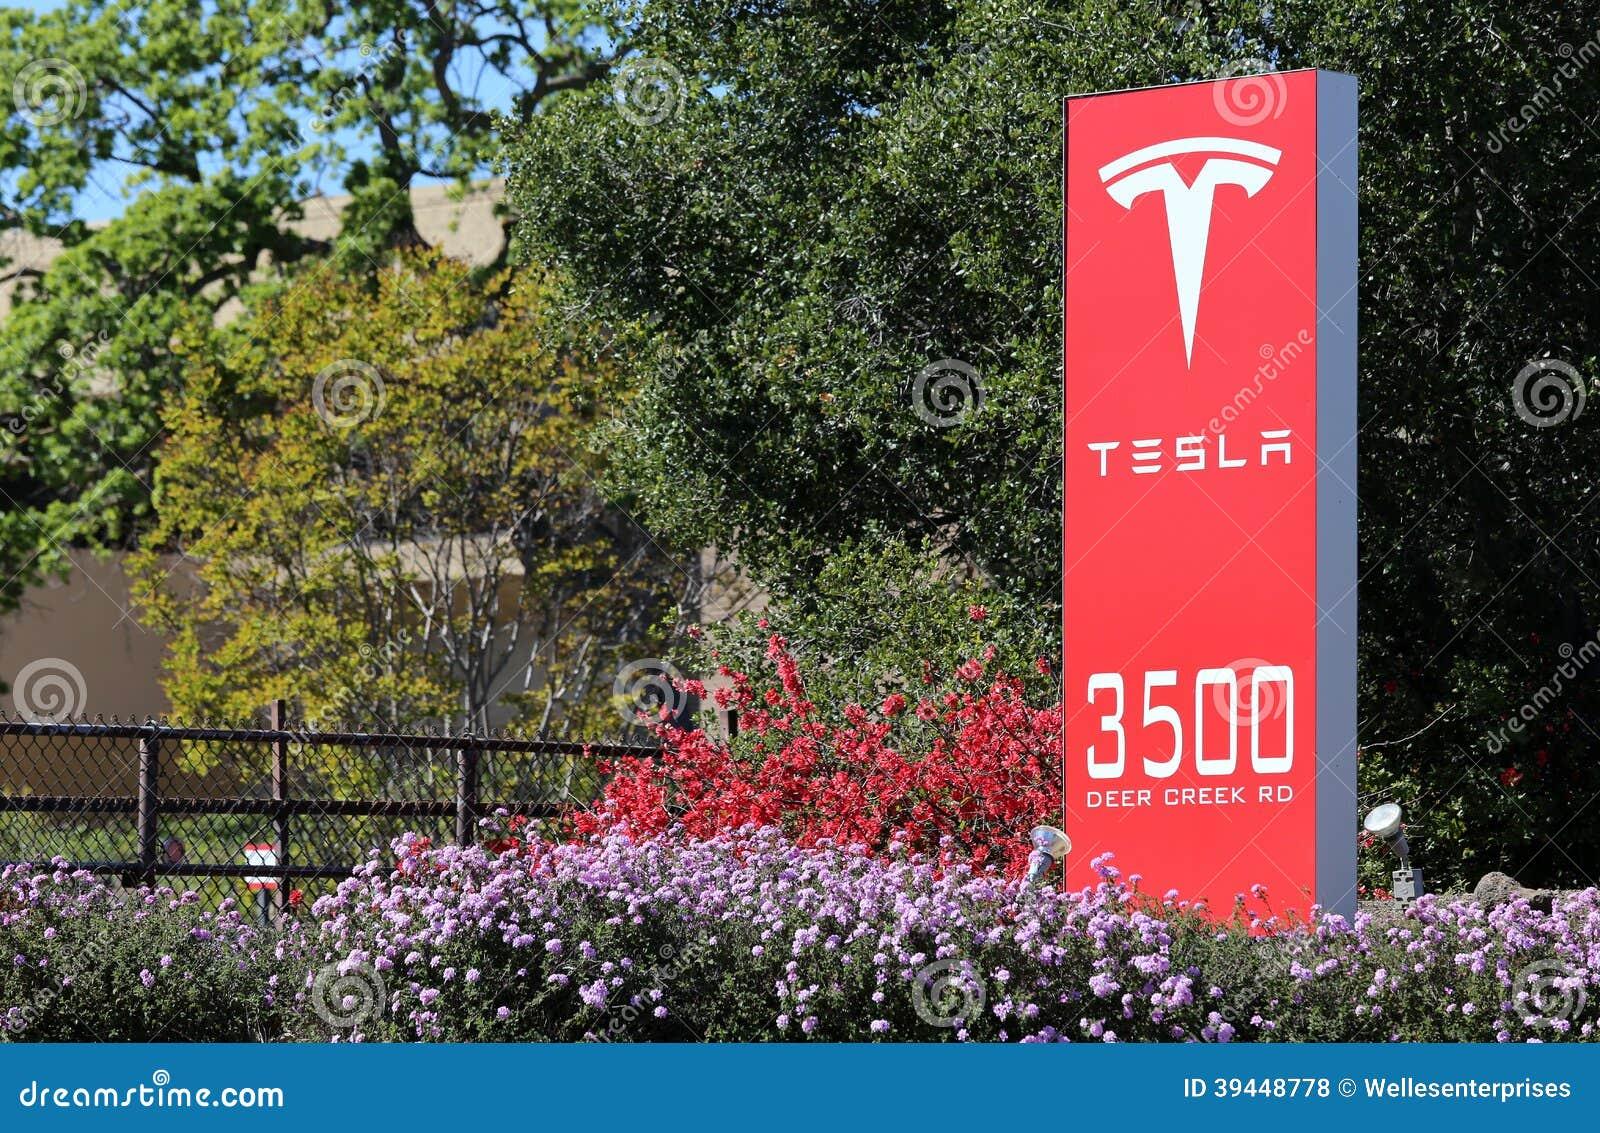 Tesla motors world headquarters editorial stock photo for Tesla motors palo alto